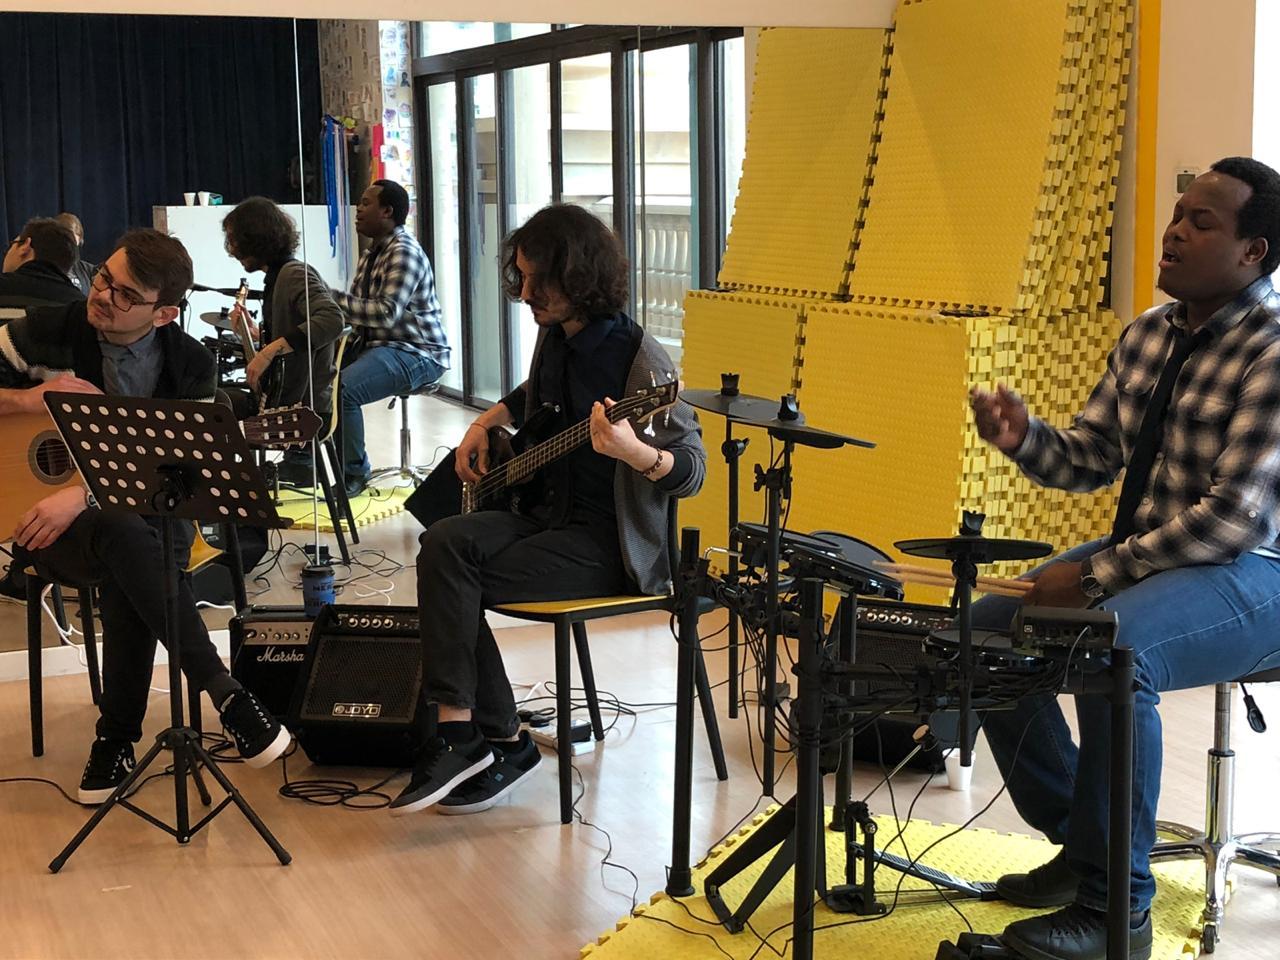 music classes in Dubai - Melodica music center palm branch